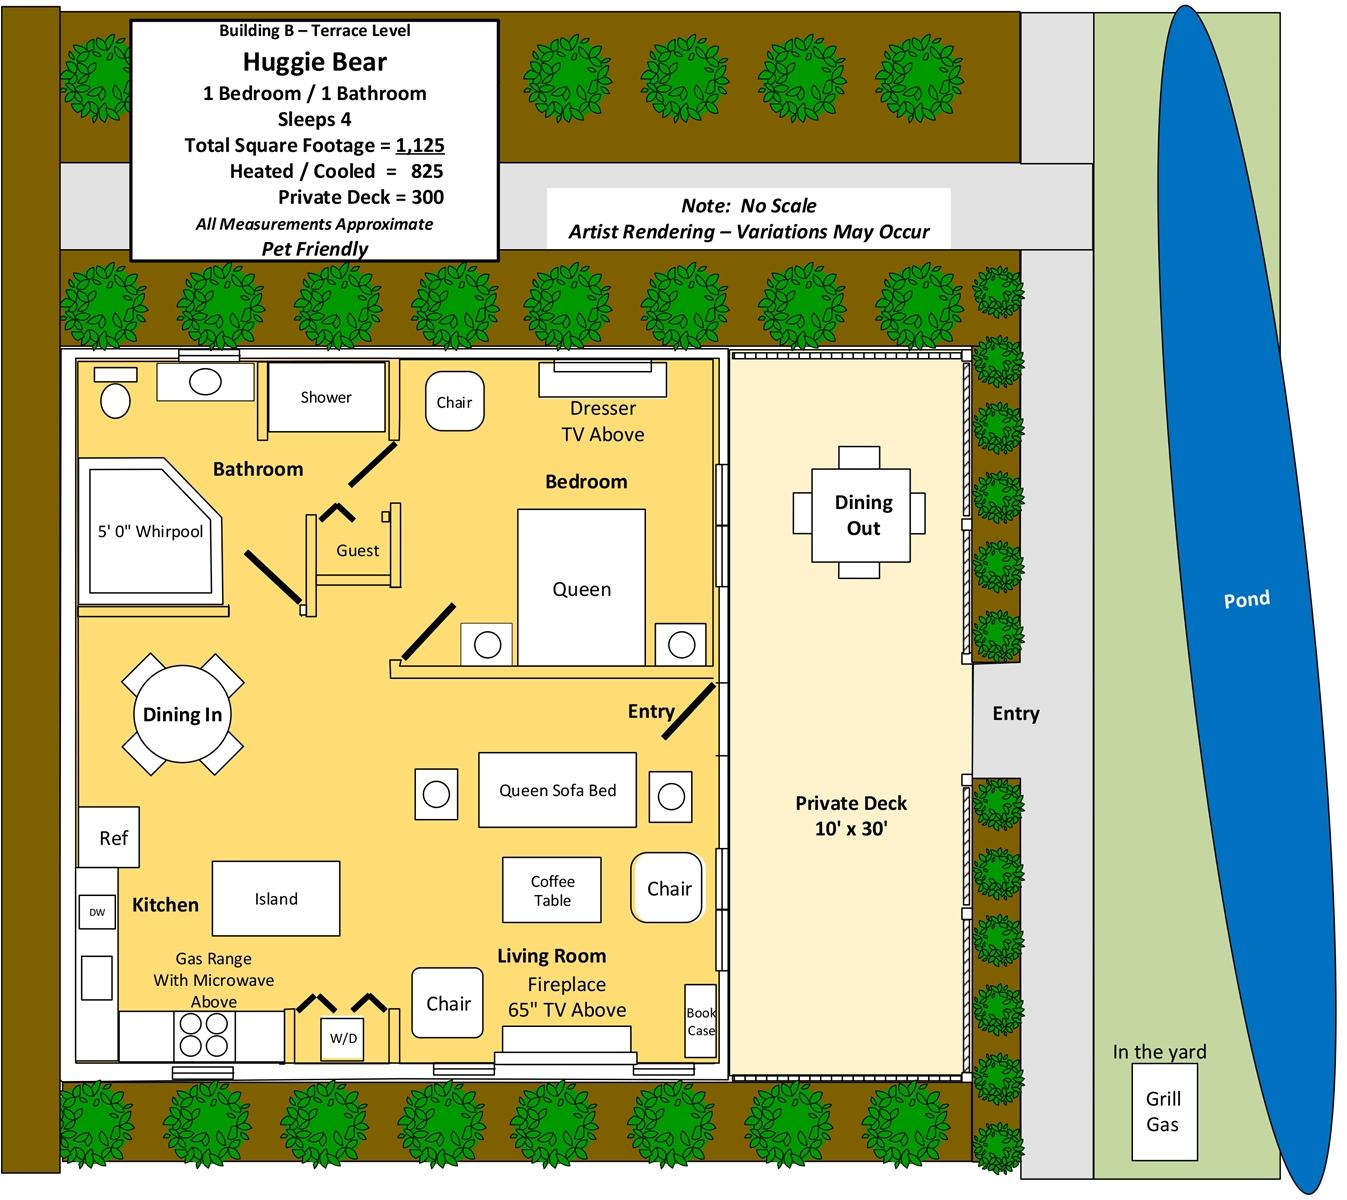 Floor Plan for Huggie Bear